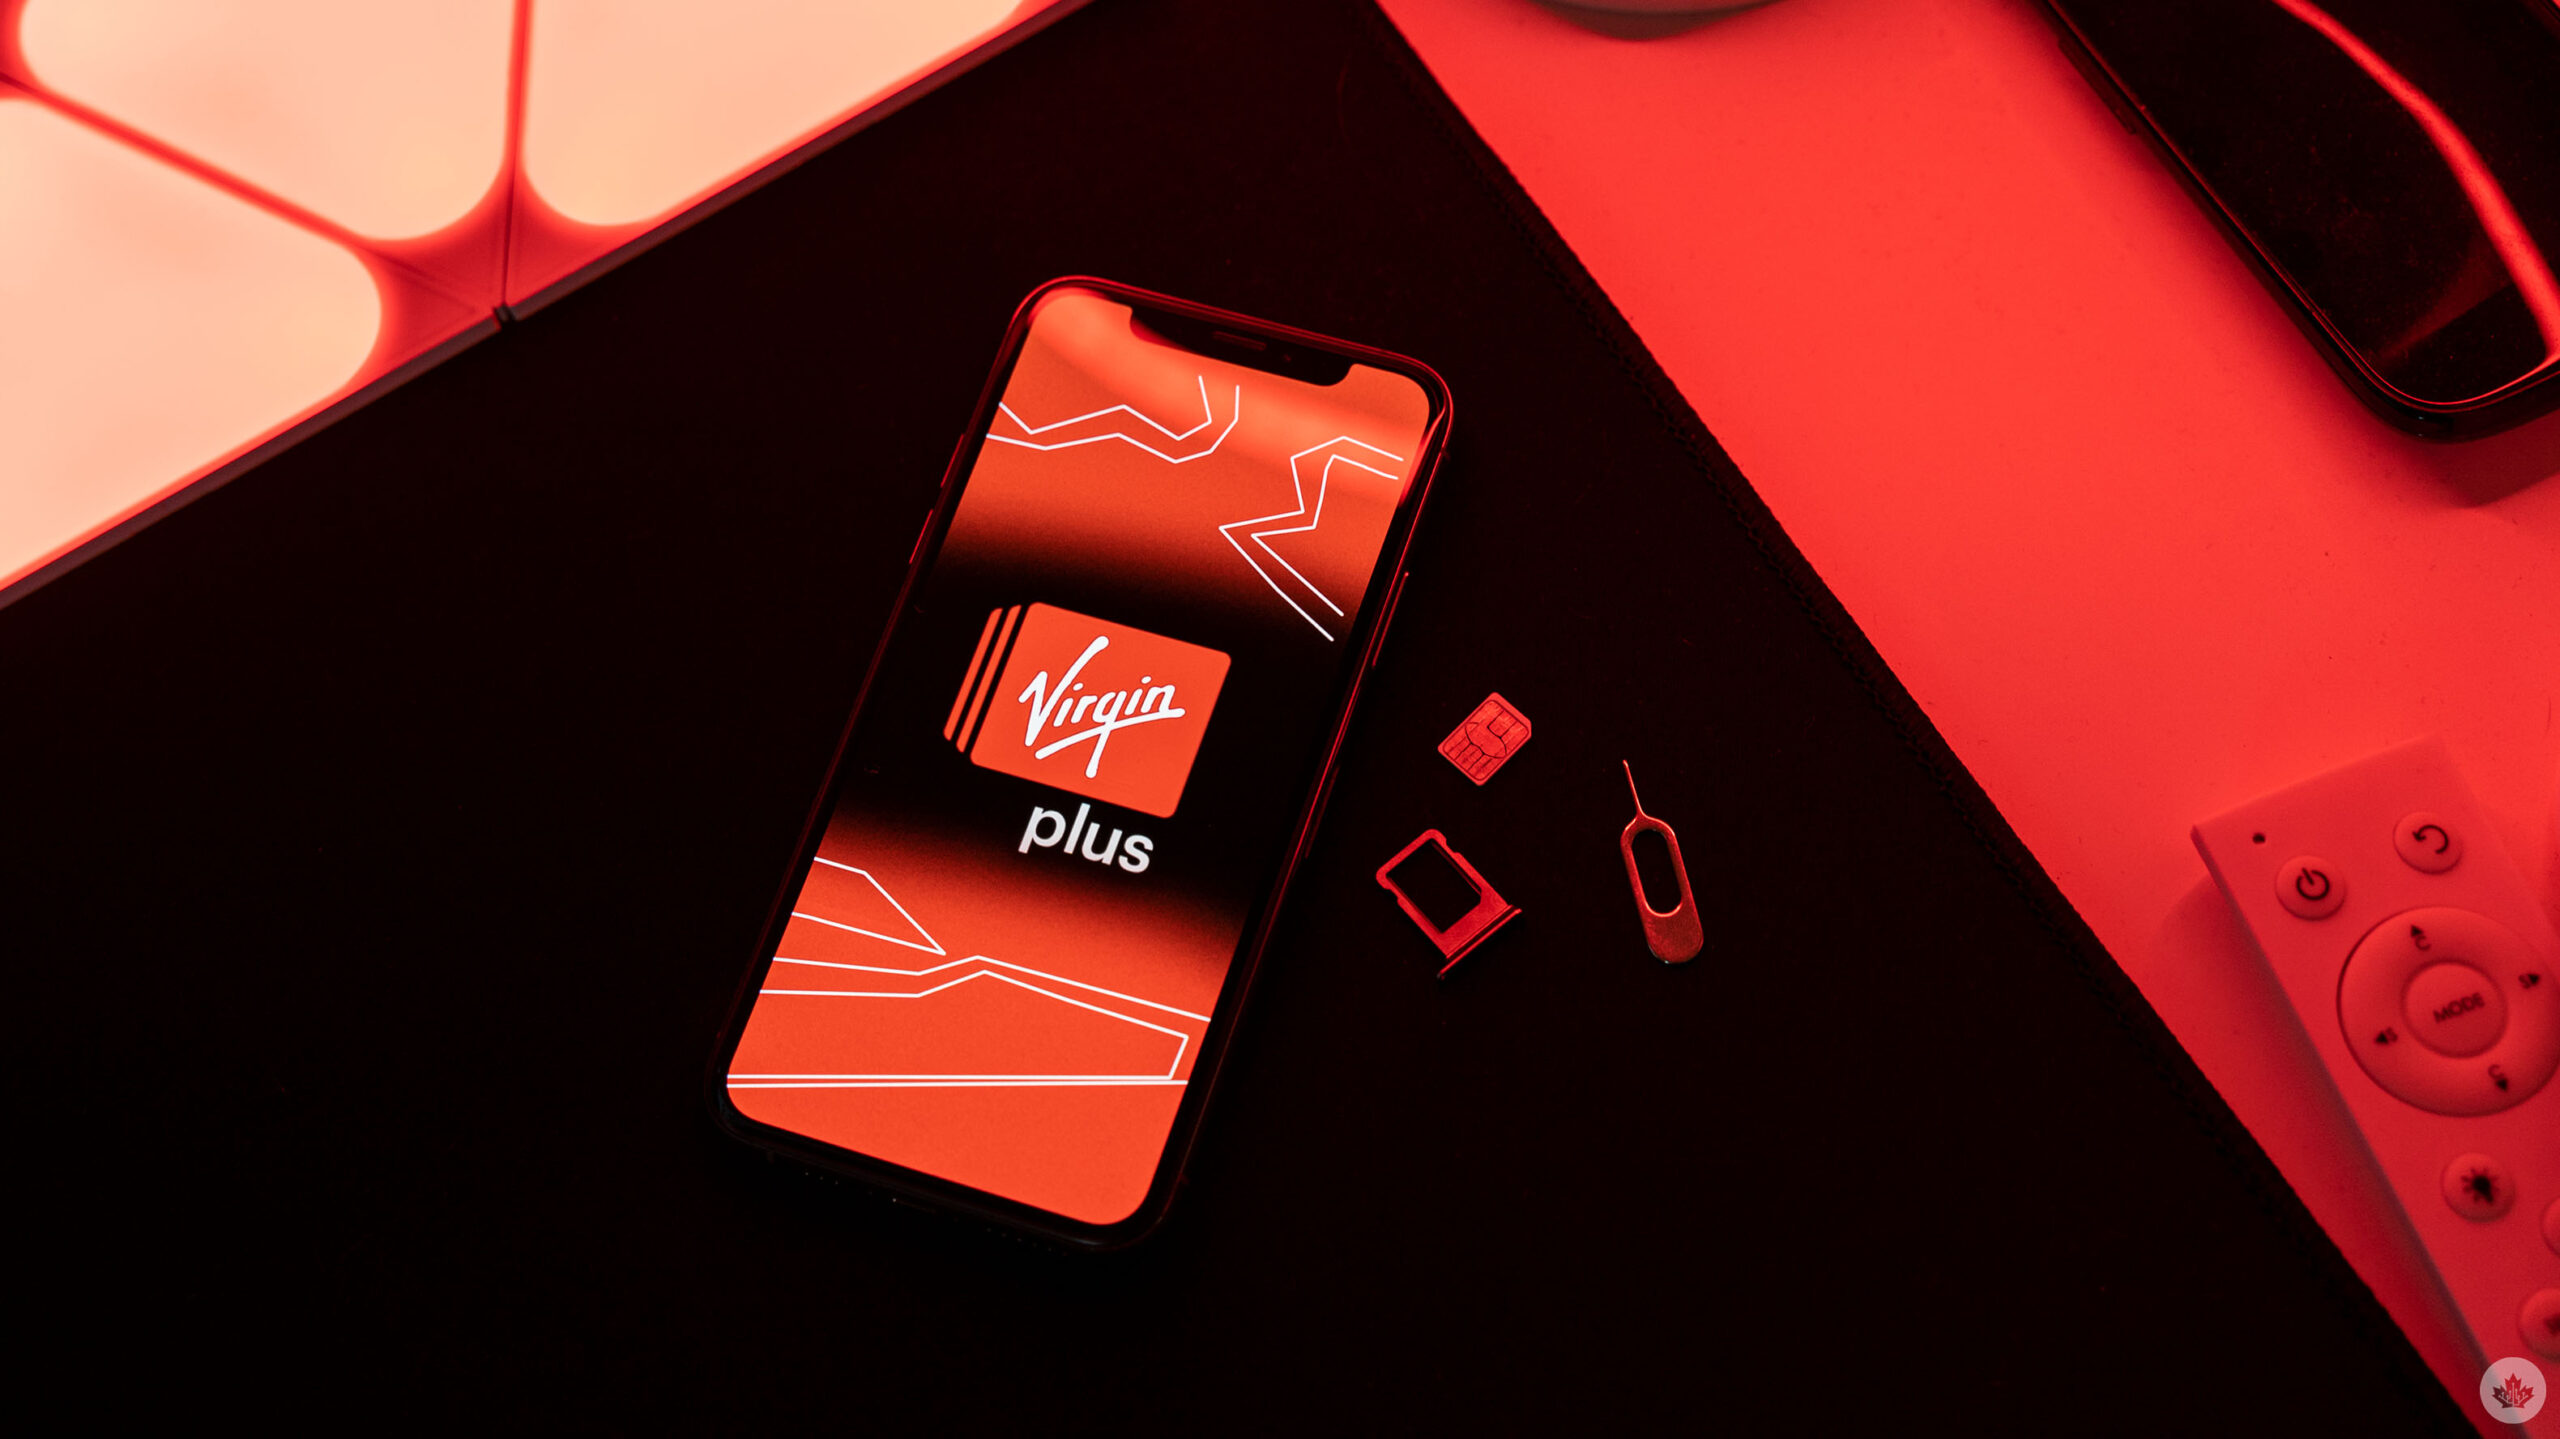 Virgin Plus logo on a phone with SIM card